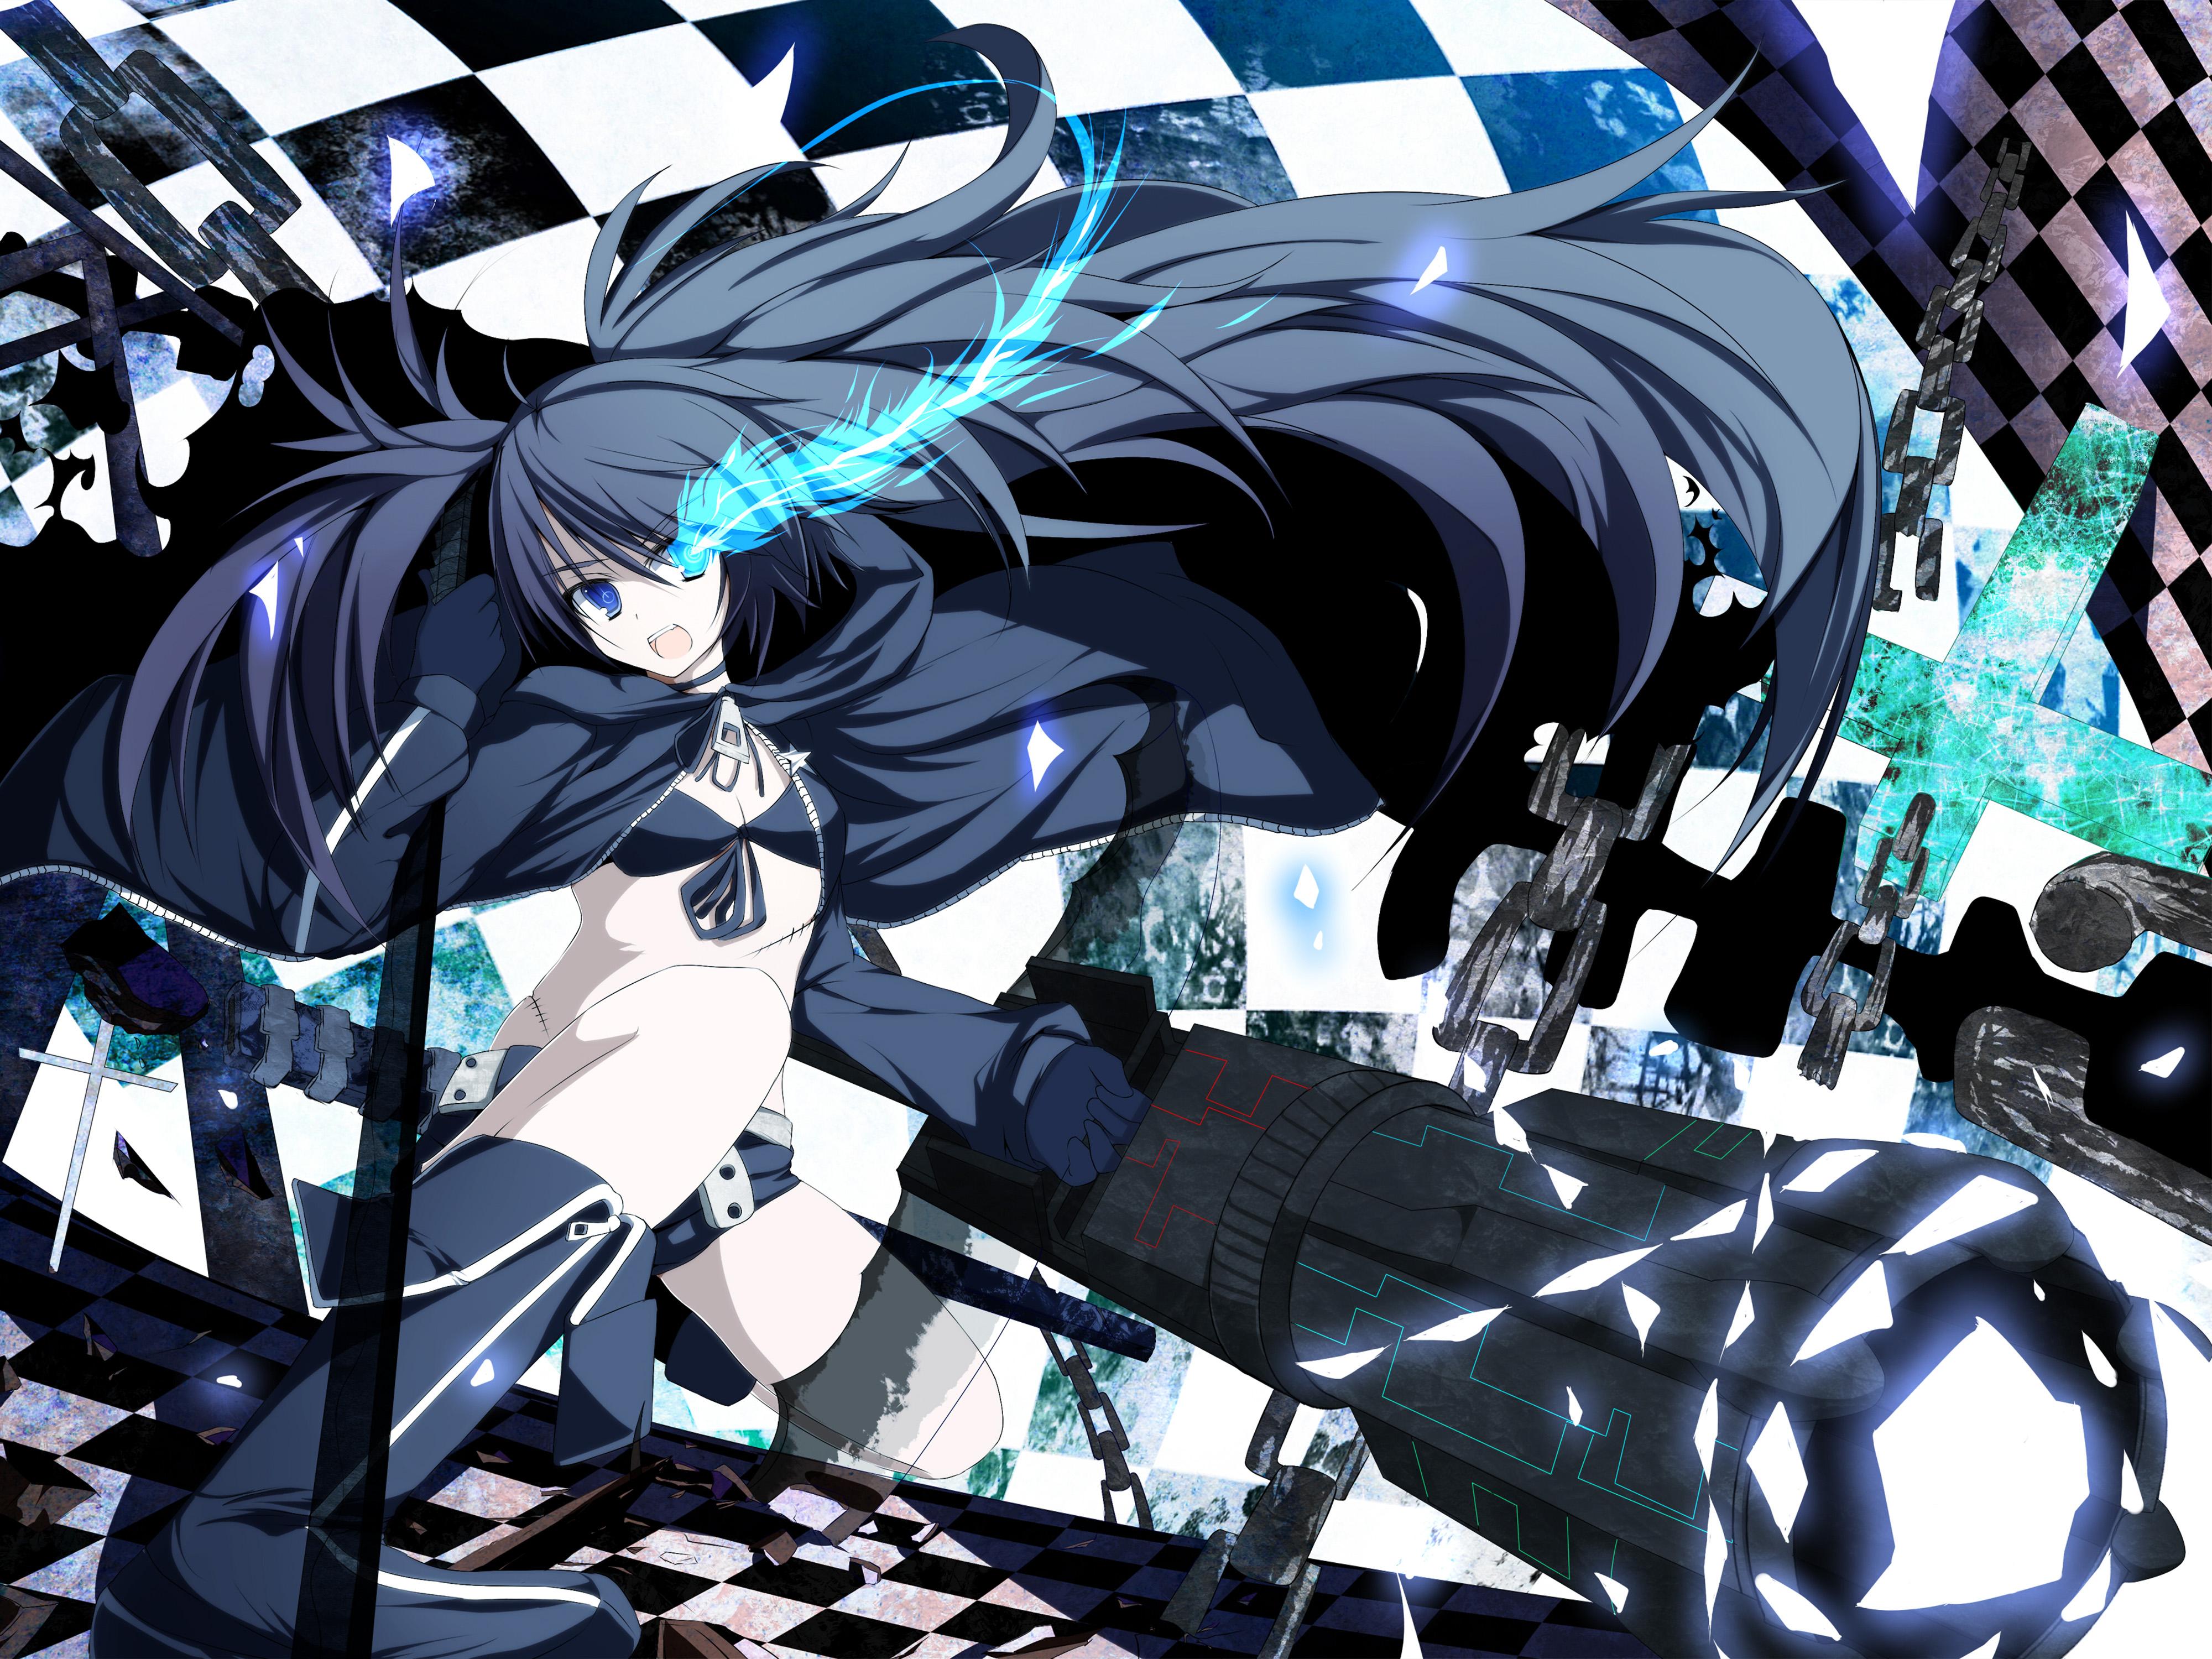 anime shooter rock gun chain insane weapons mato 4k hair hd eyes weapon wallpapers background kuro asterisk macam preview desktop